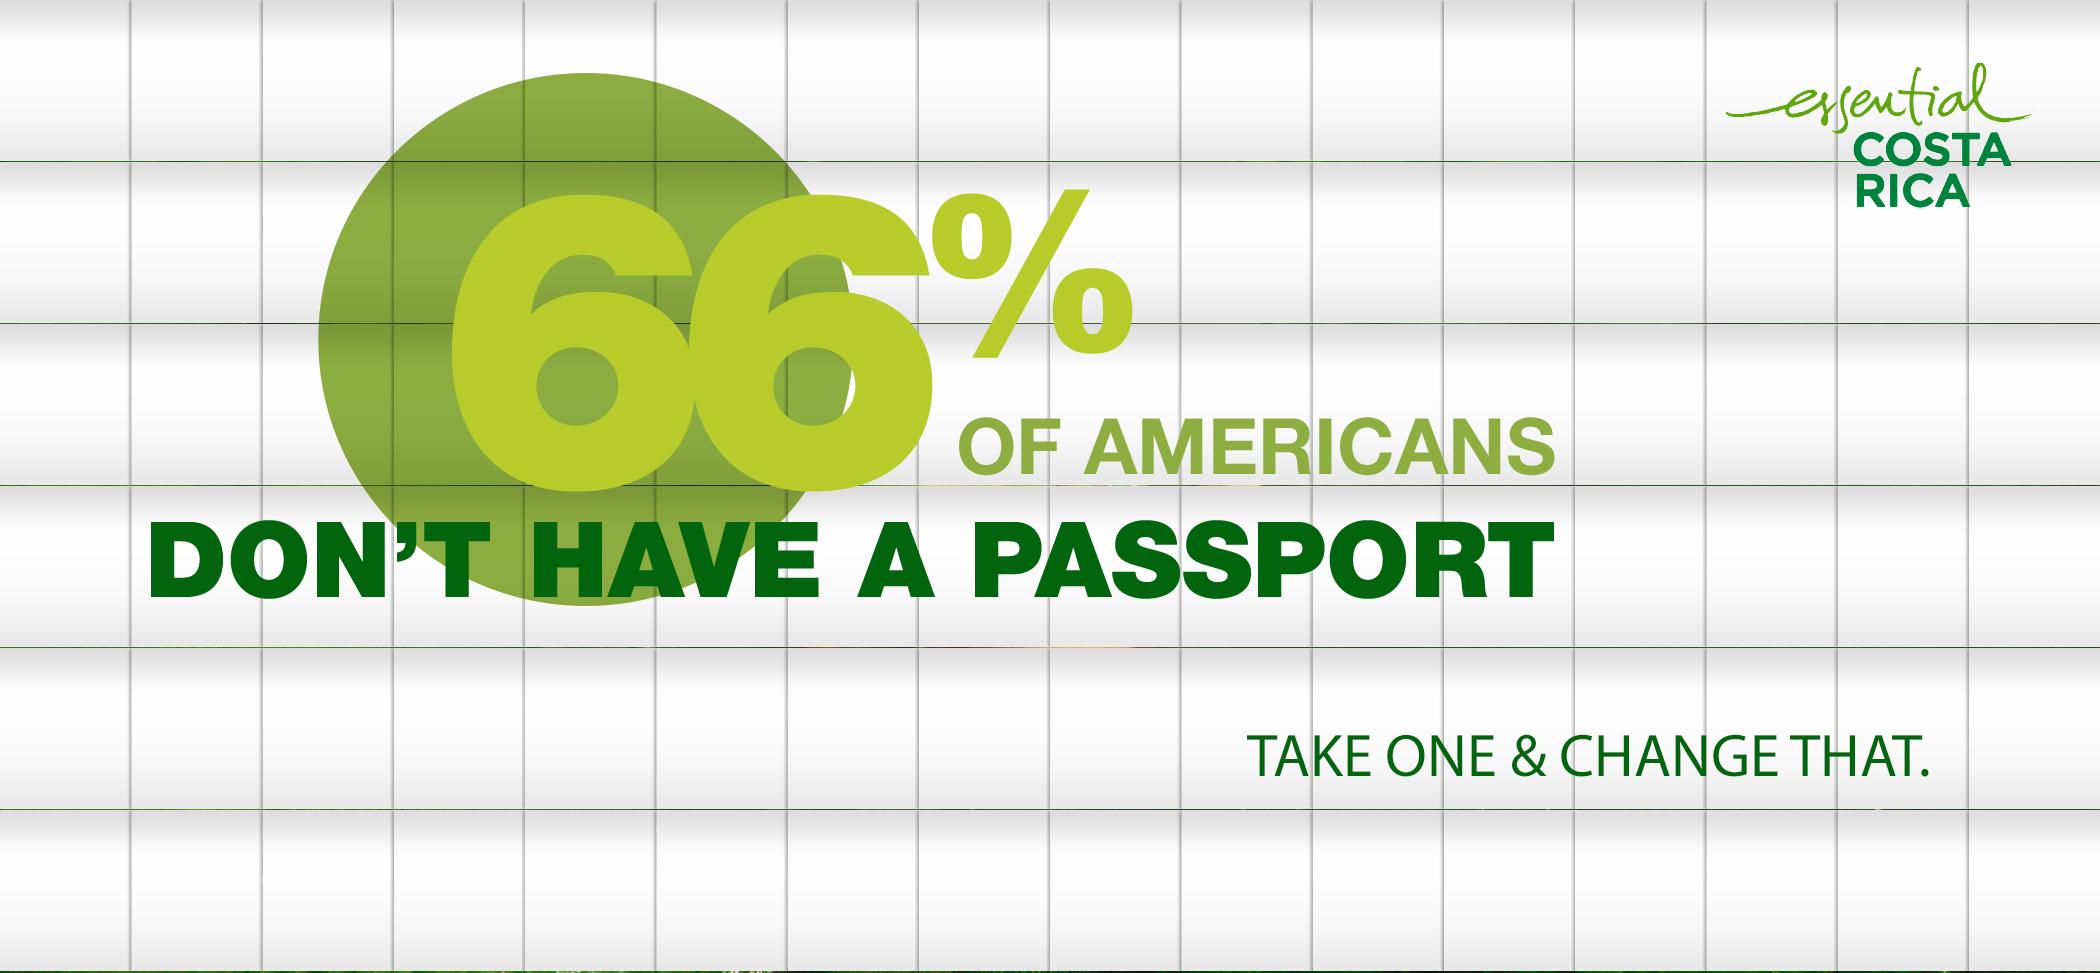 CR_passport_bilboard_JK_01.jpg